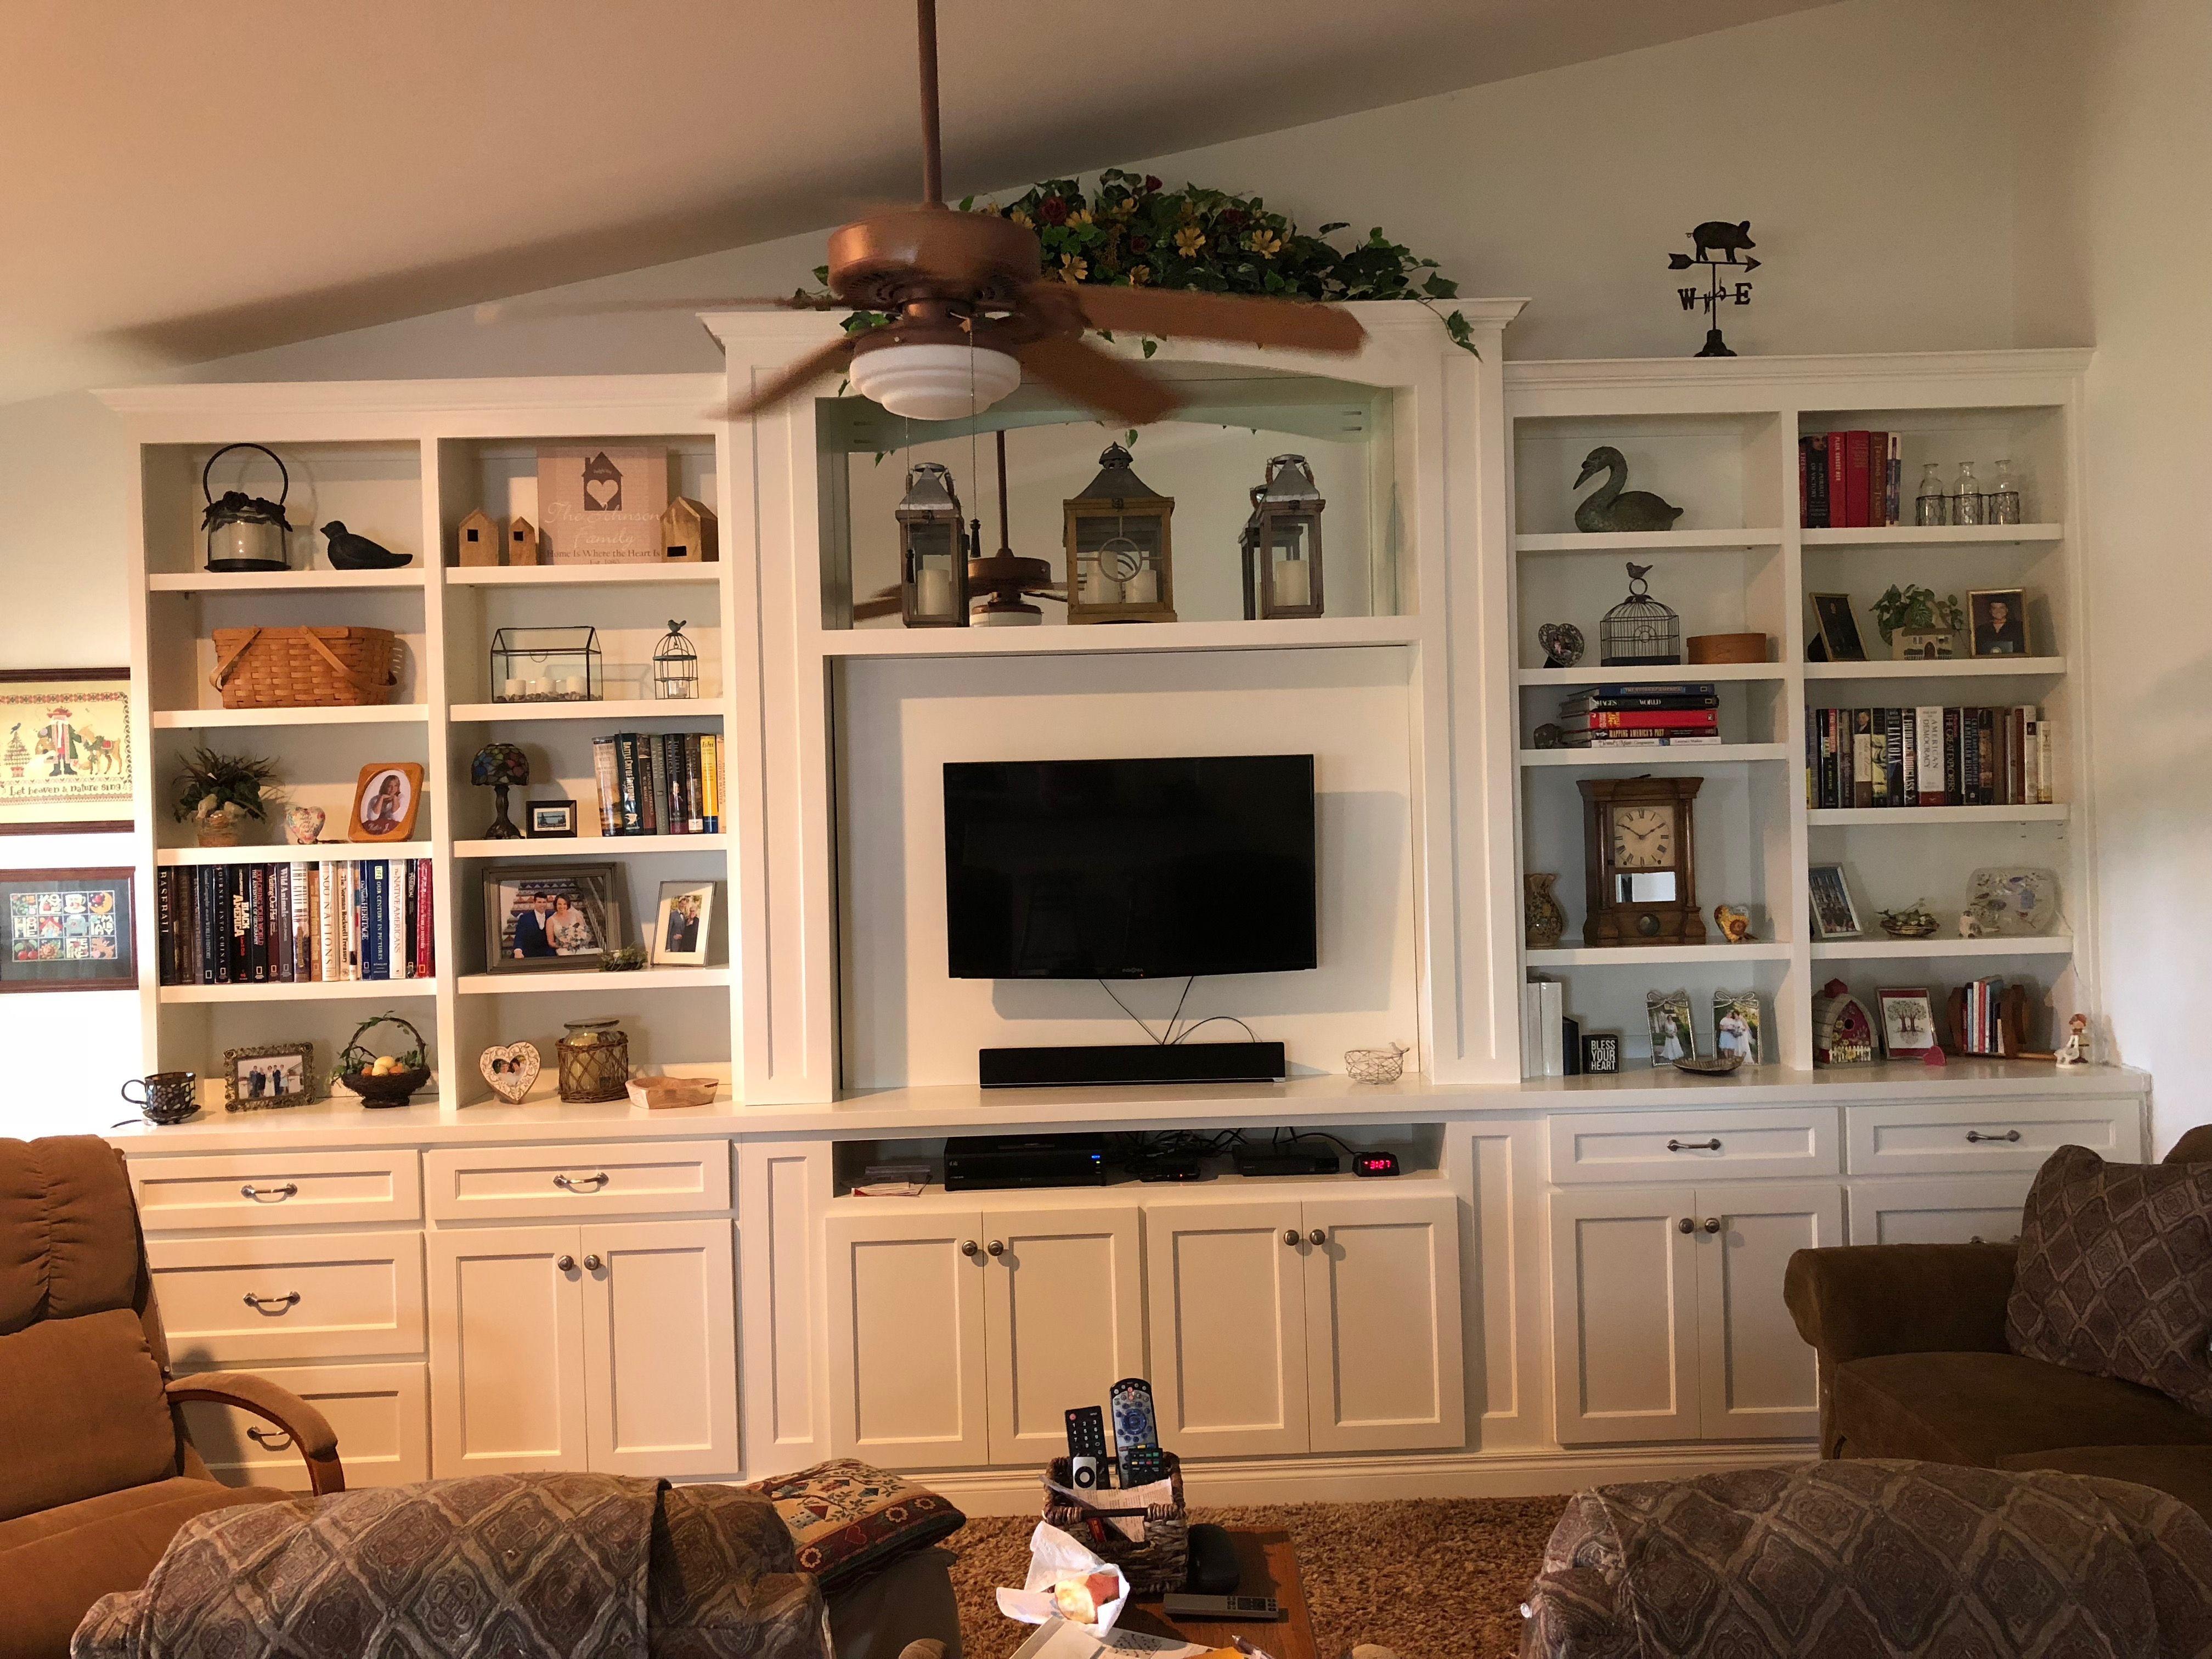 Modern Farmhouse Wall Unit Decorations Home Decor Living